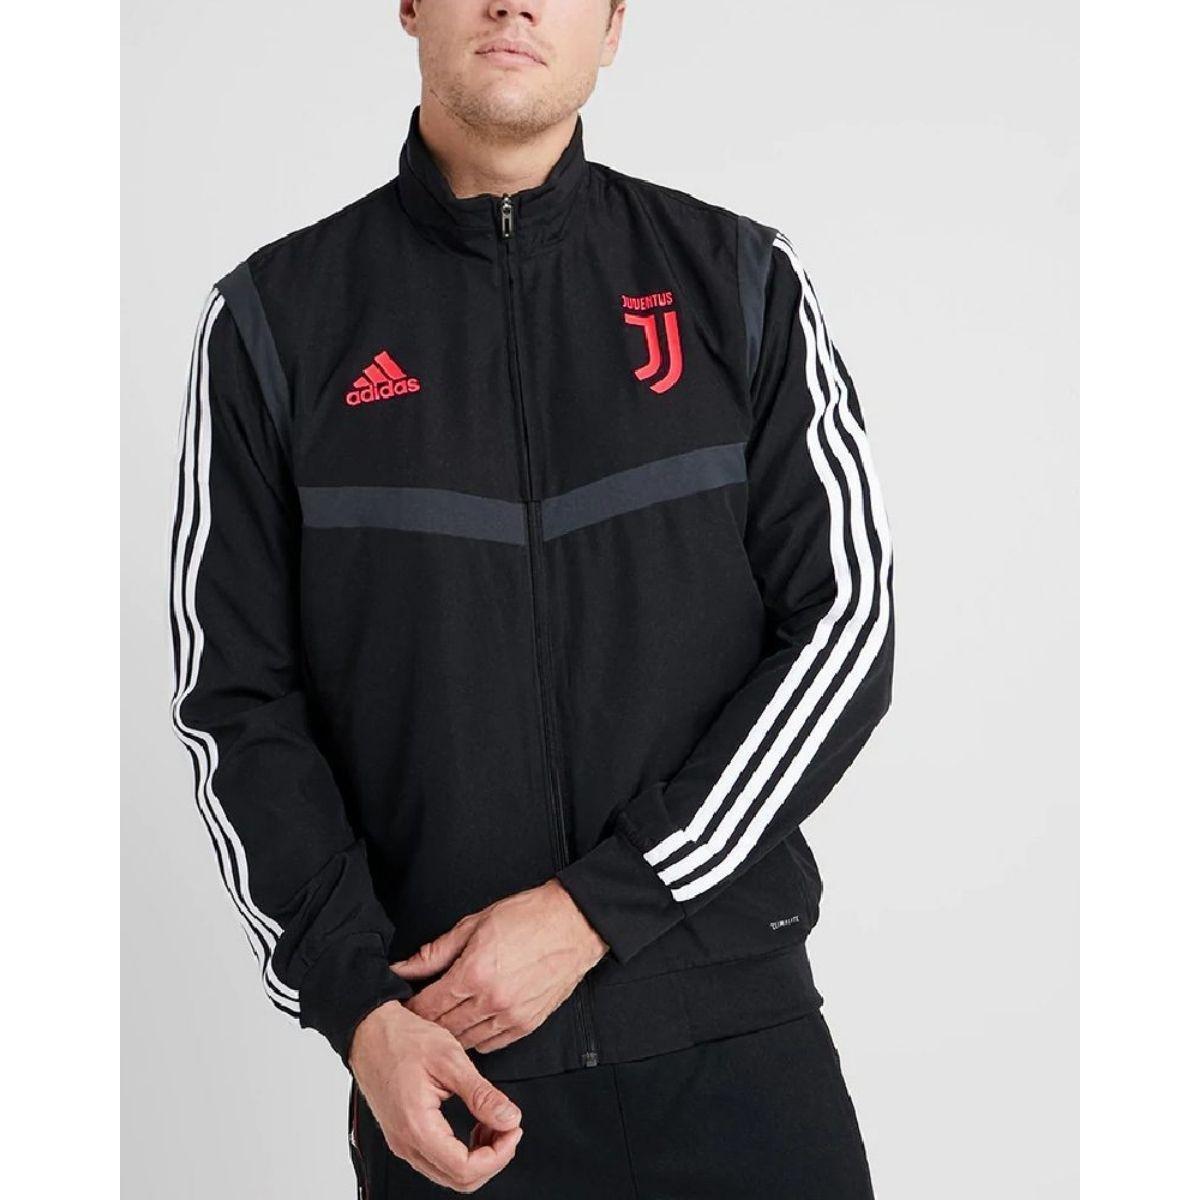 Felpa Adidas Juventus...